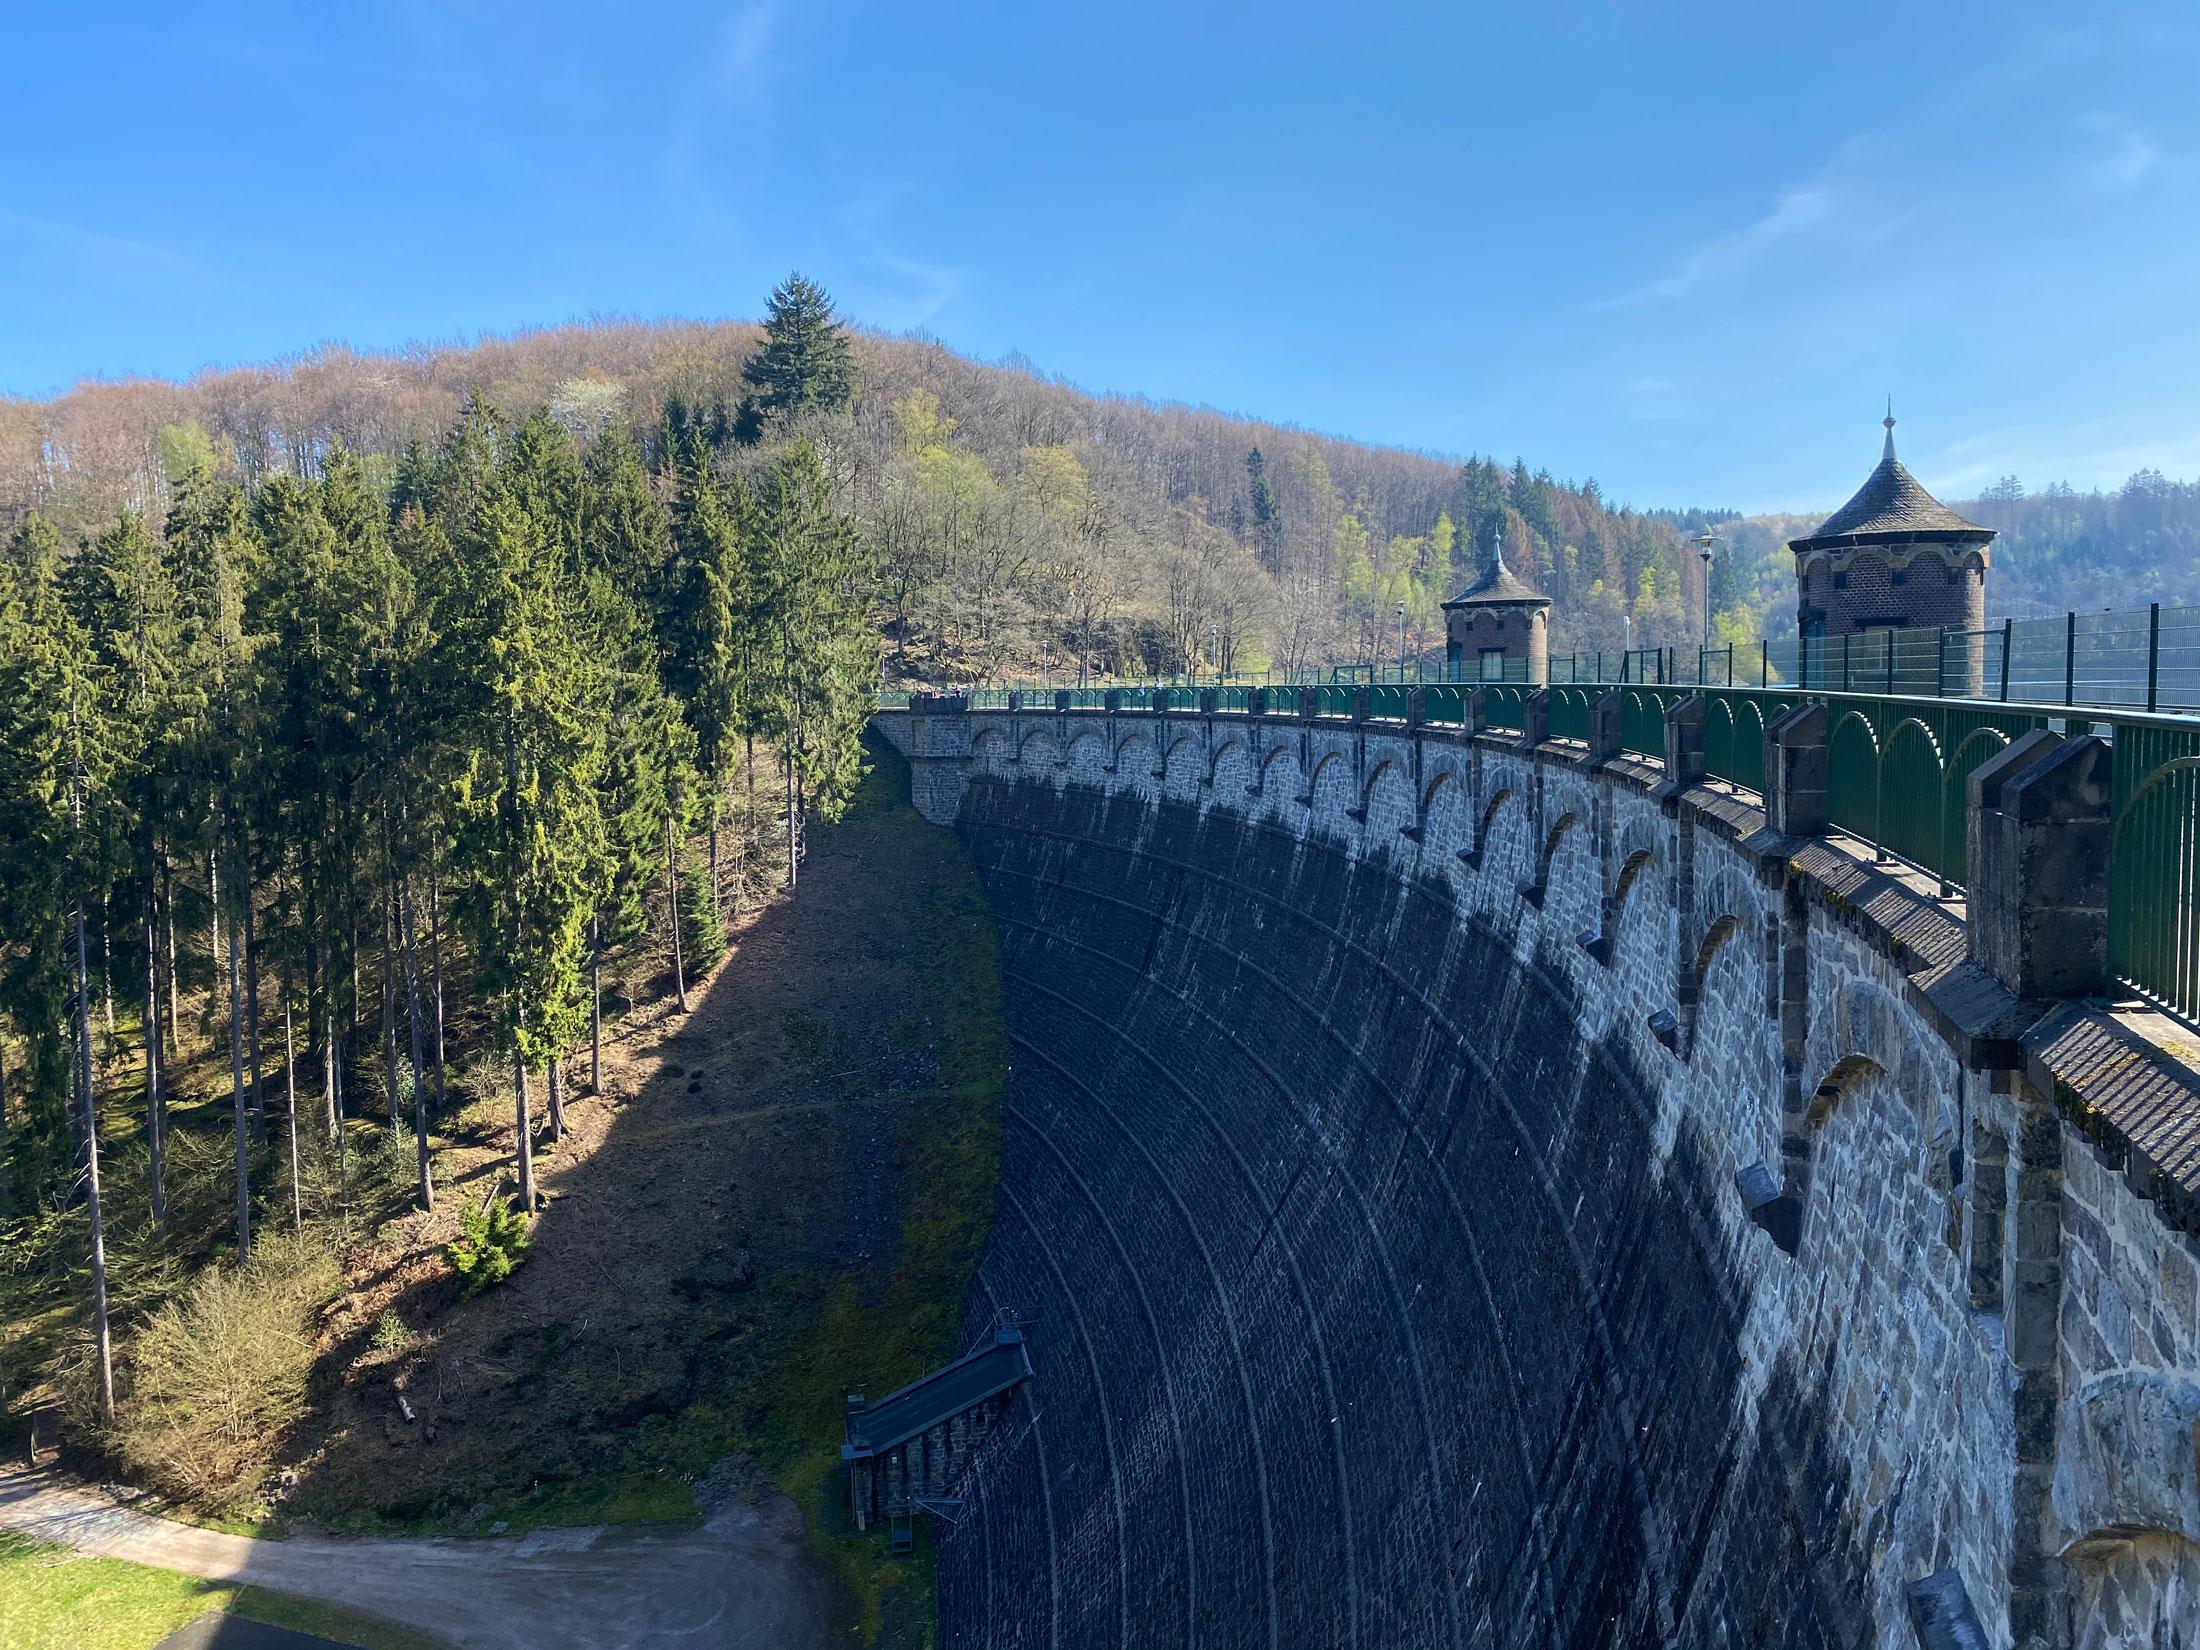 Sengbachtalsperre in Solingen - Walk and Wonder